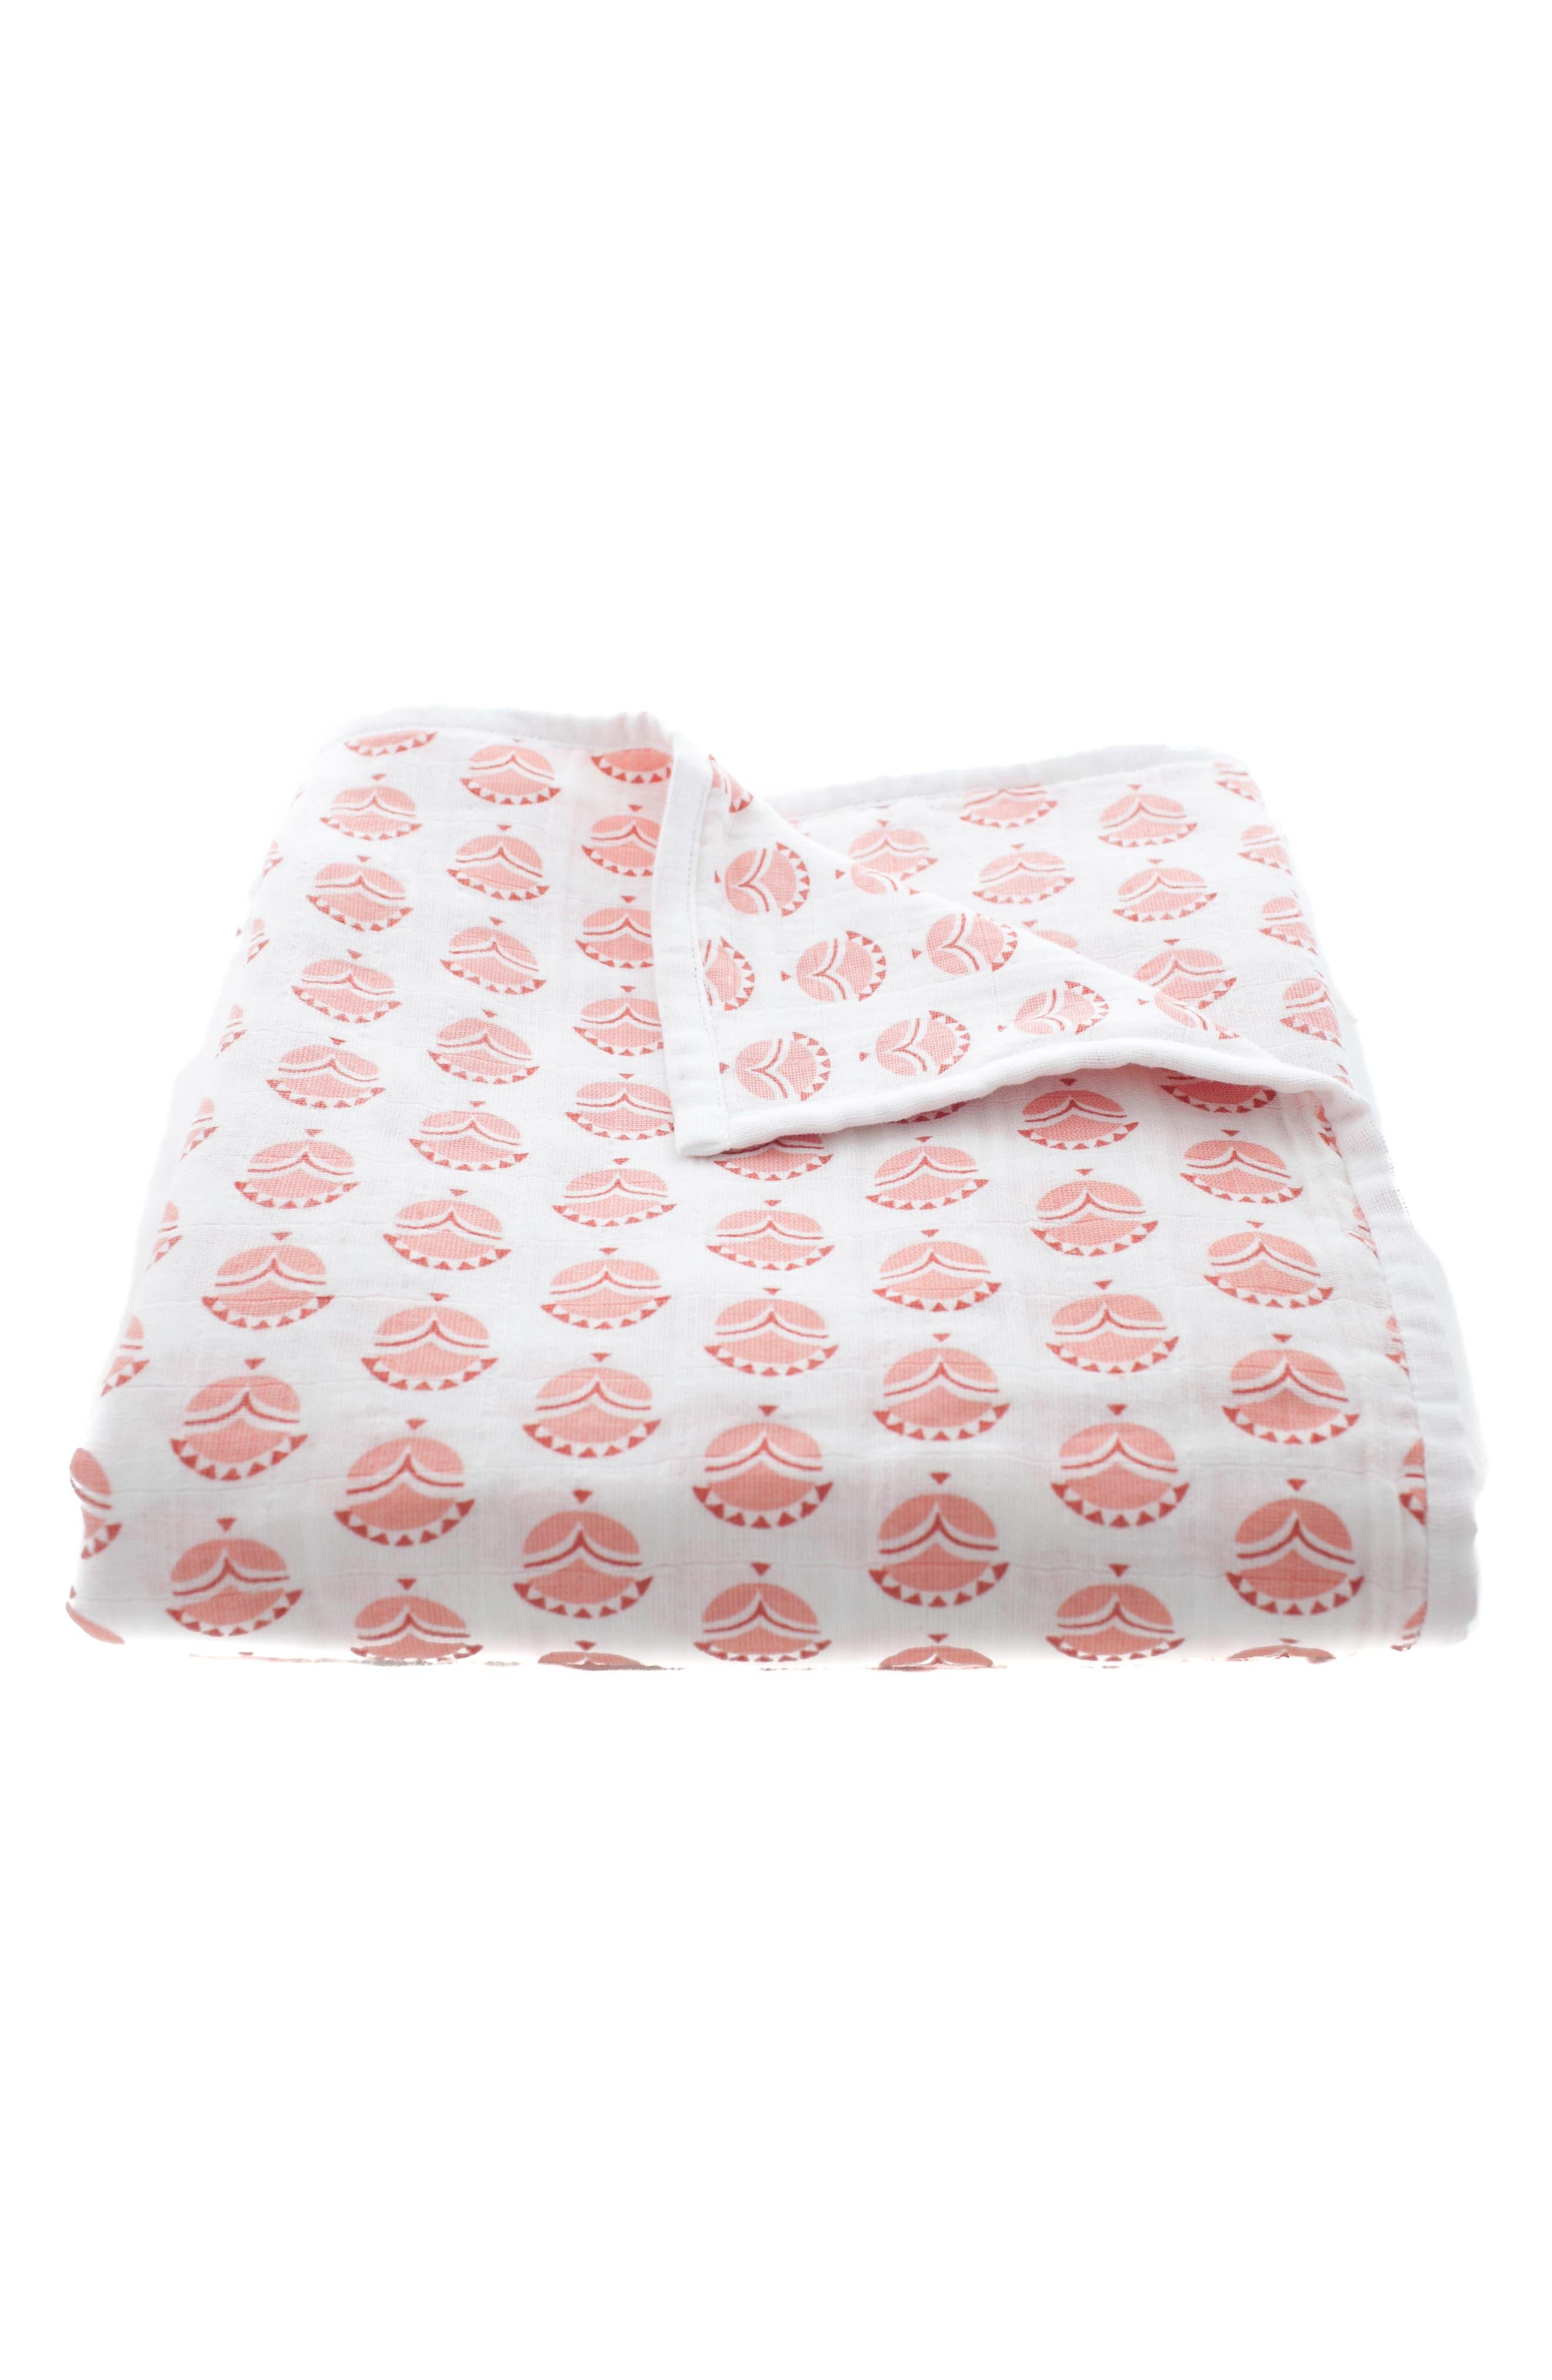 Mia Organic Cotton Blanket,                             Main thumbnail 3, color,